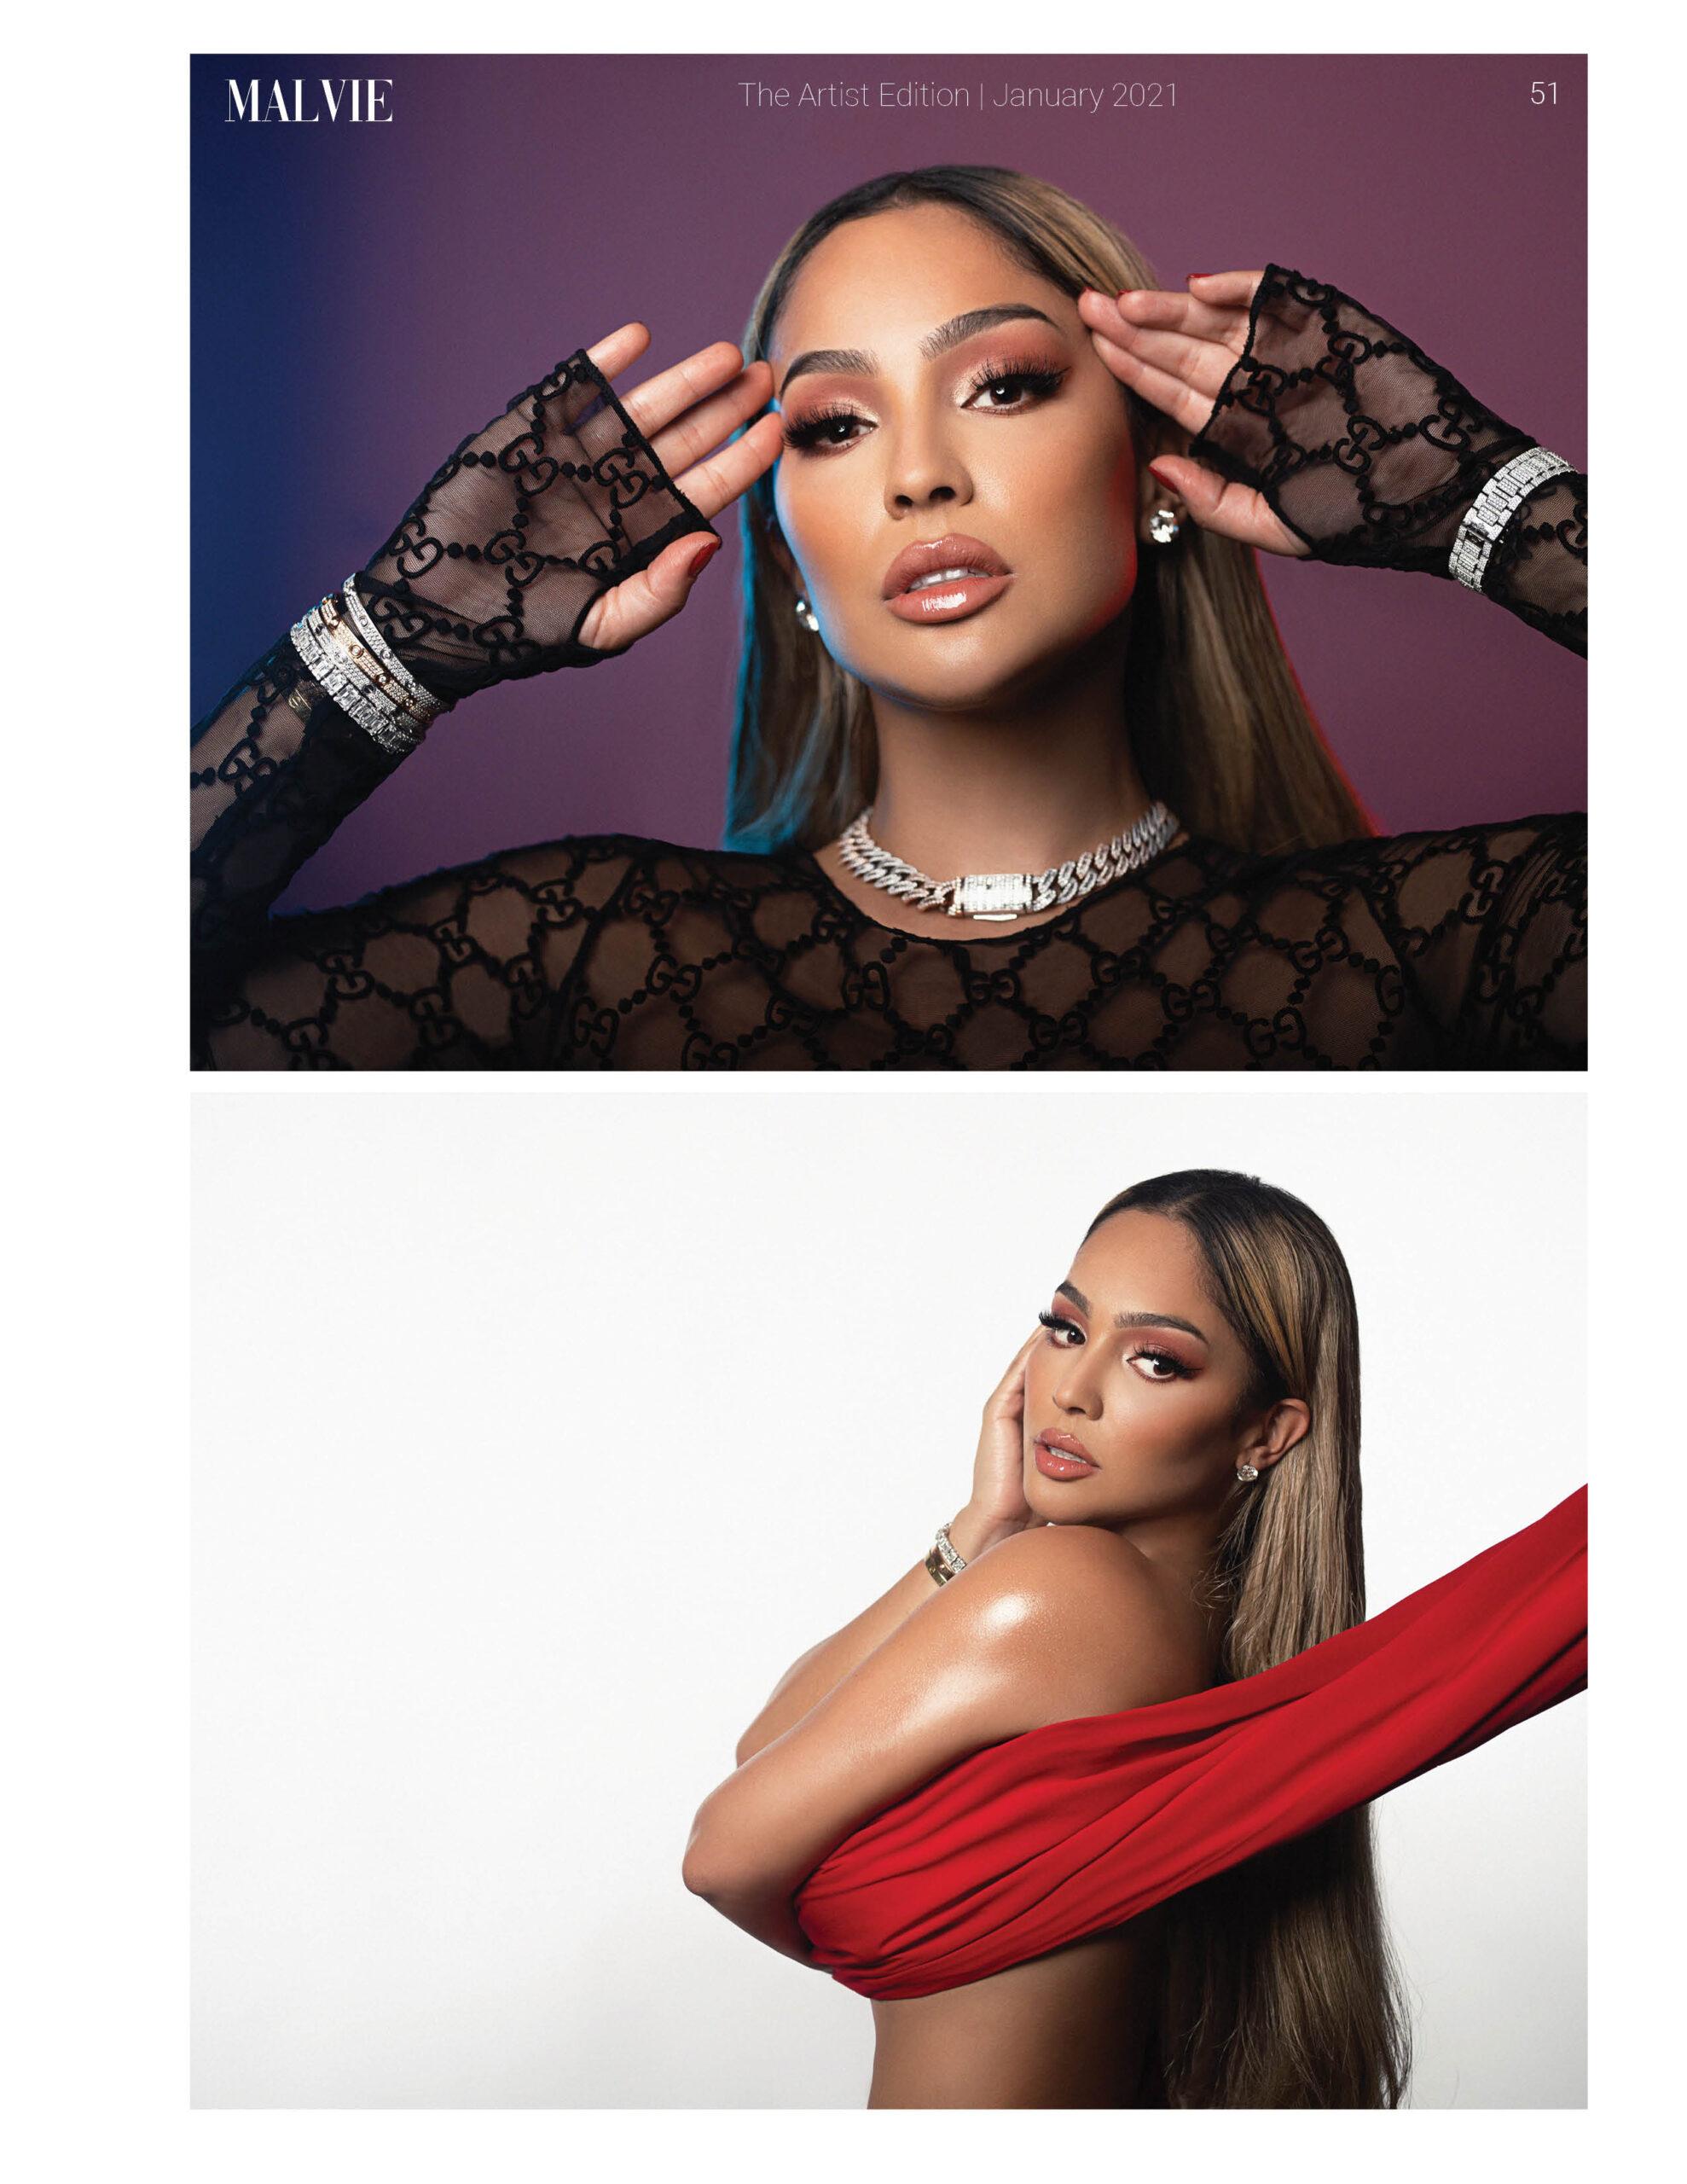 MALVIE Magazine The Artist Edition Vol 128 January 2021 51